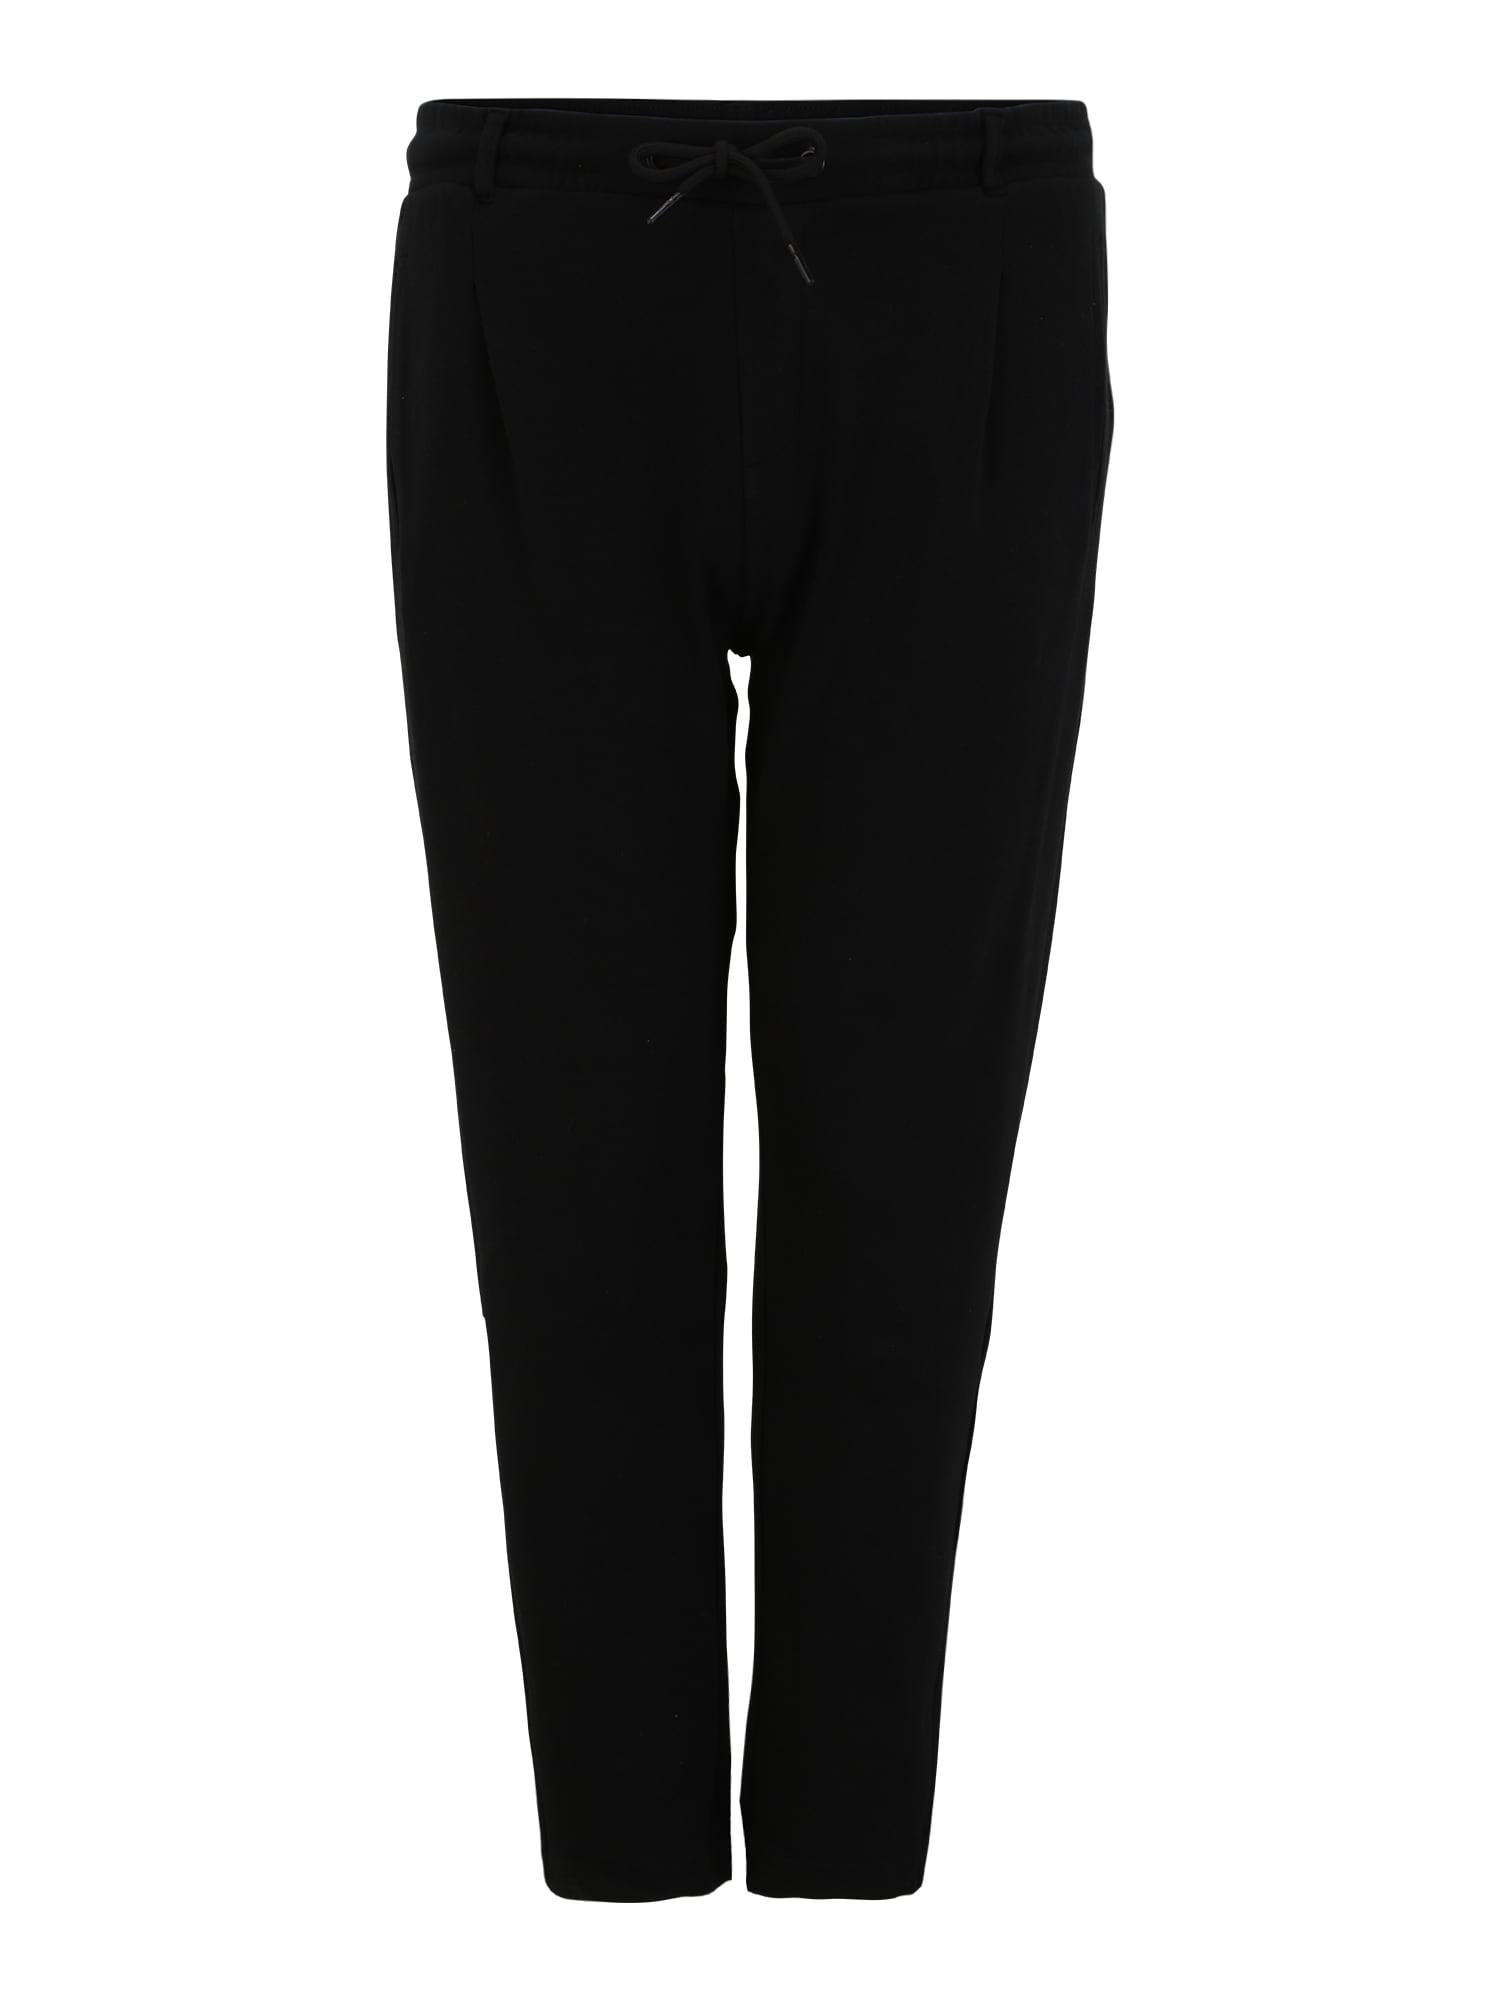 Urban Classics Big & Tall Klostuotos kelnės juoda